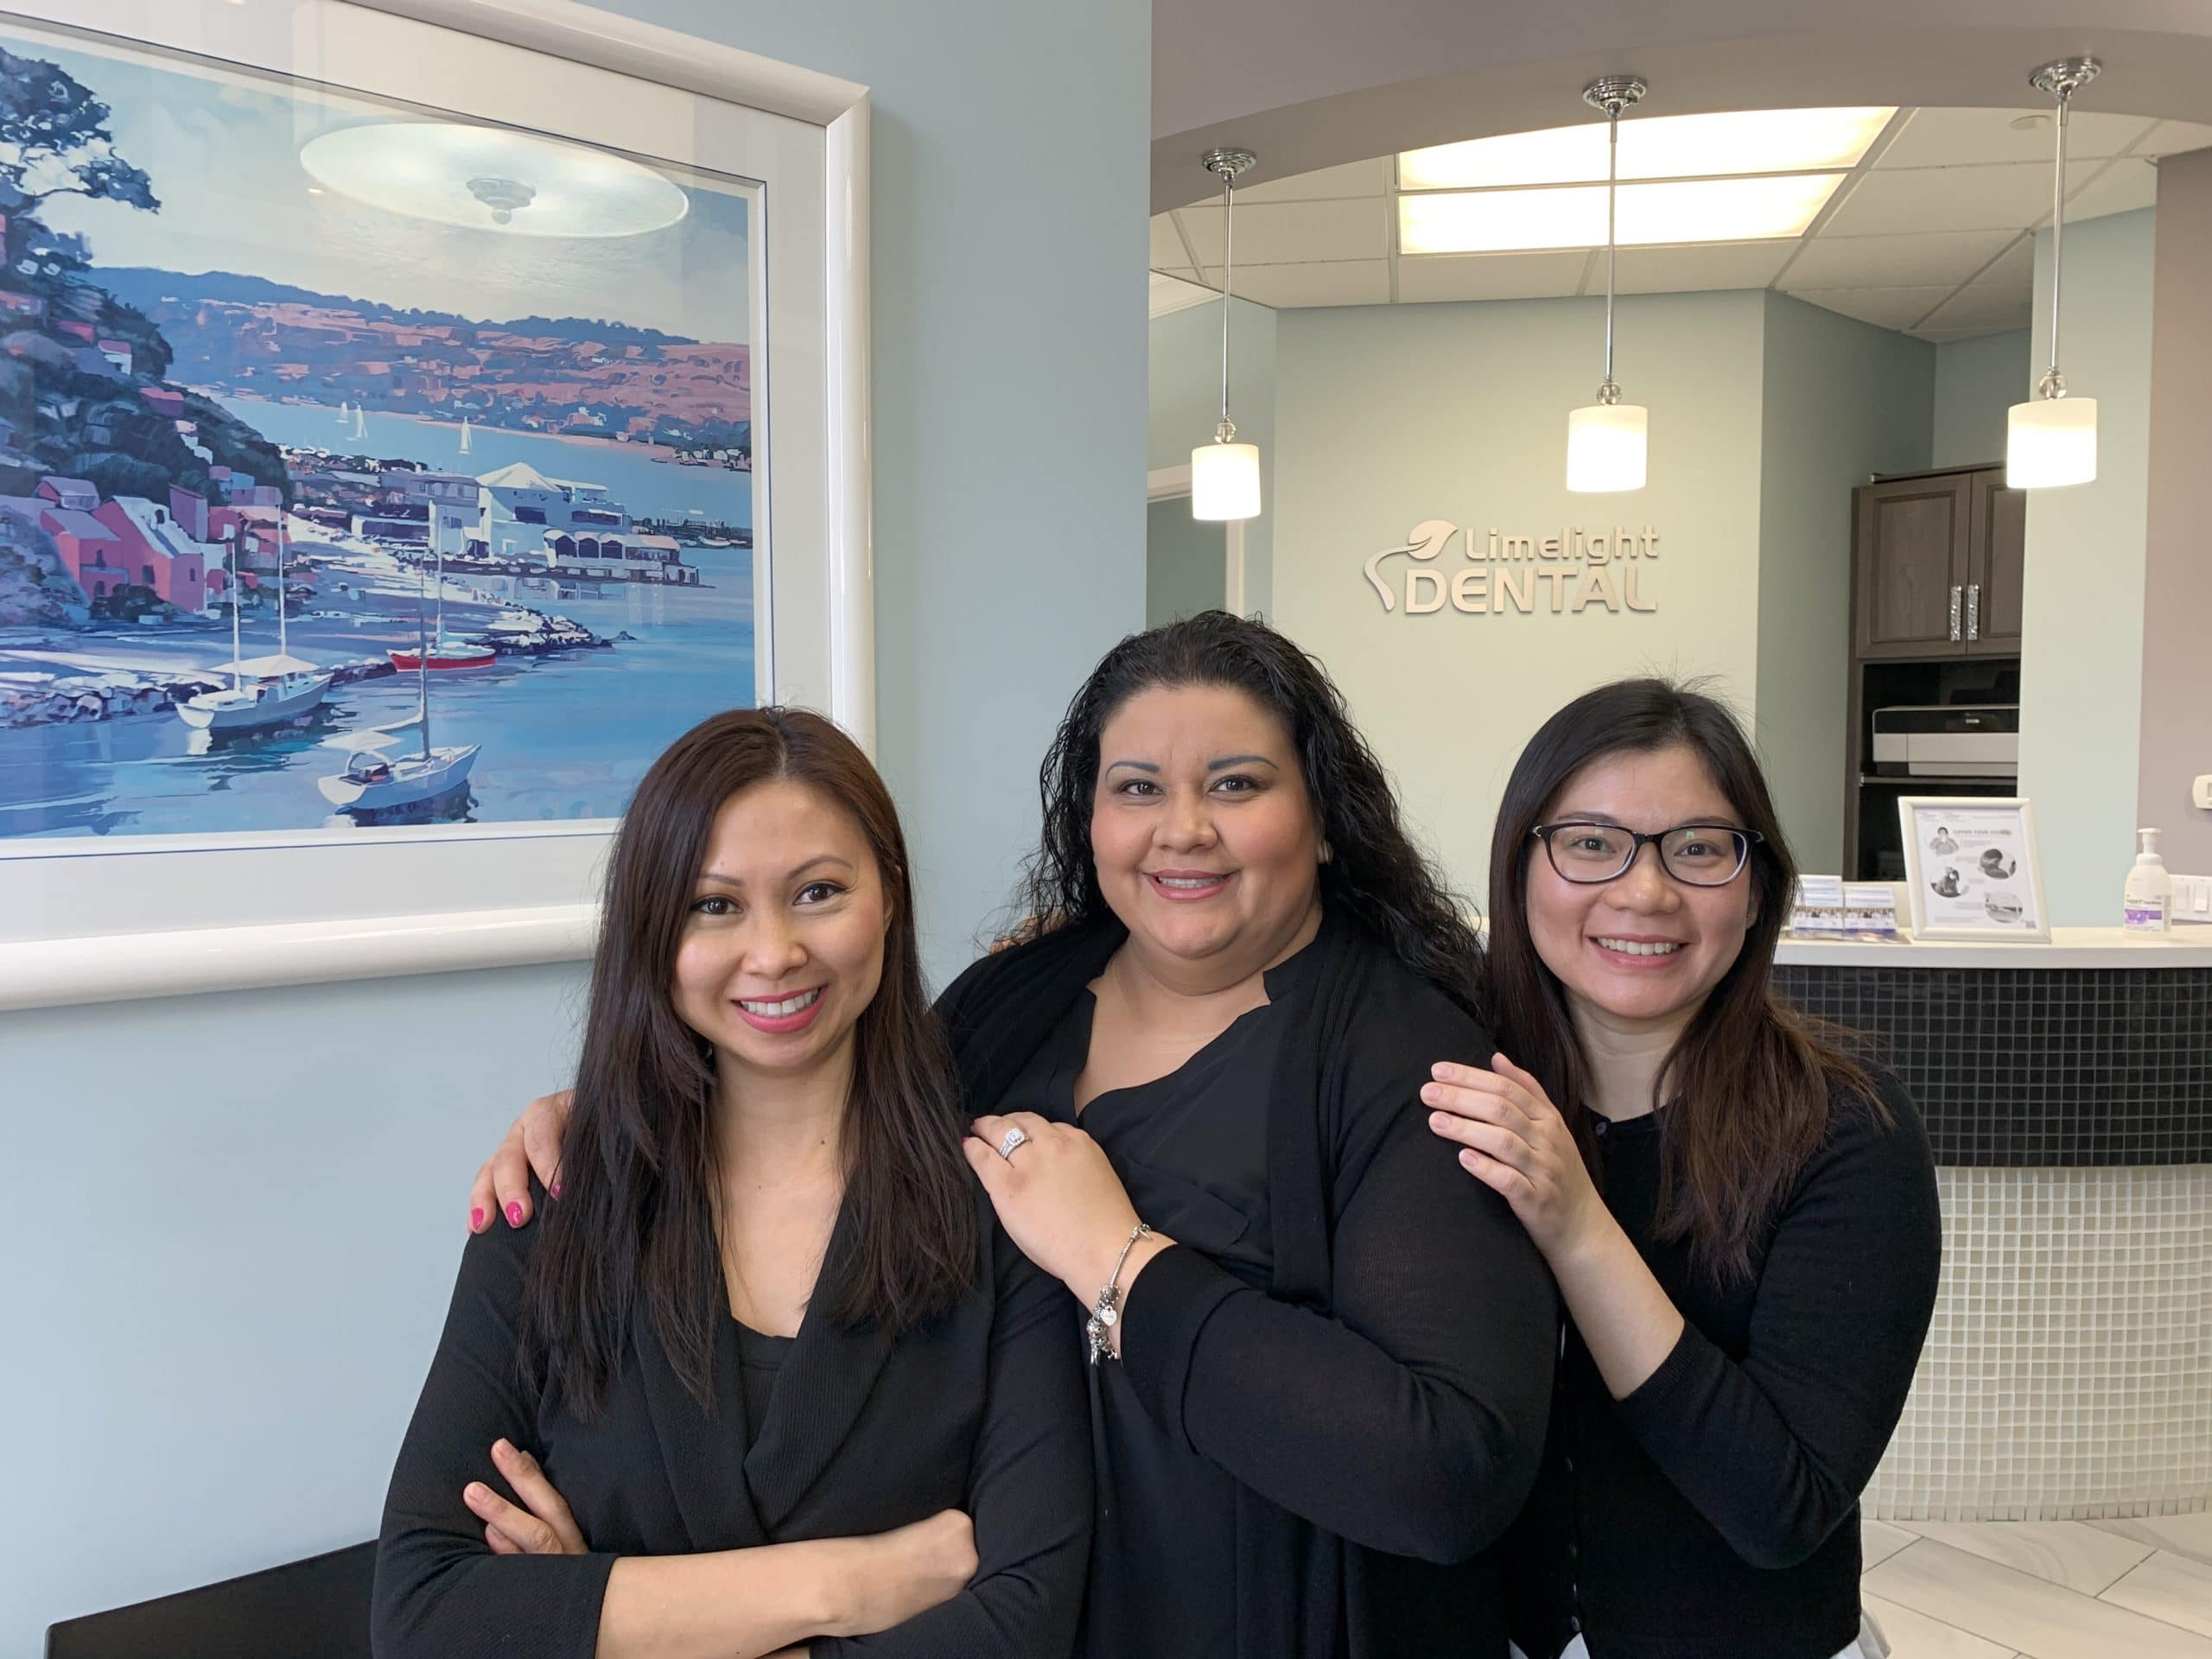 Limelight Dental Staff Team